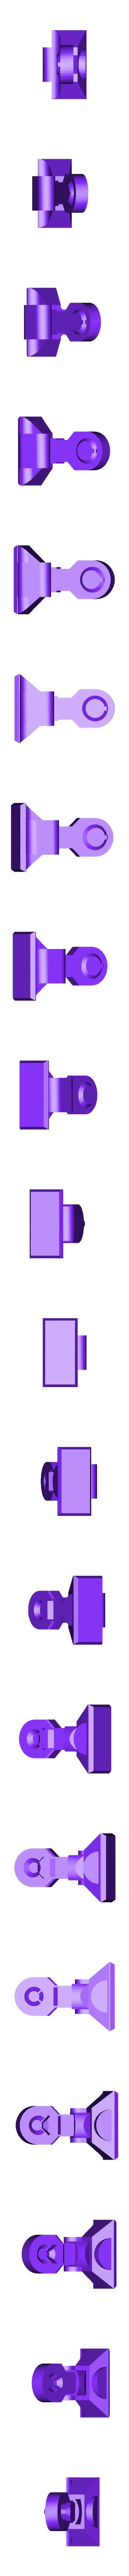 Leg_L.STL Download STL file Droid Echo Dot (4th Gen) Holder • 3D printing object, biglildesign